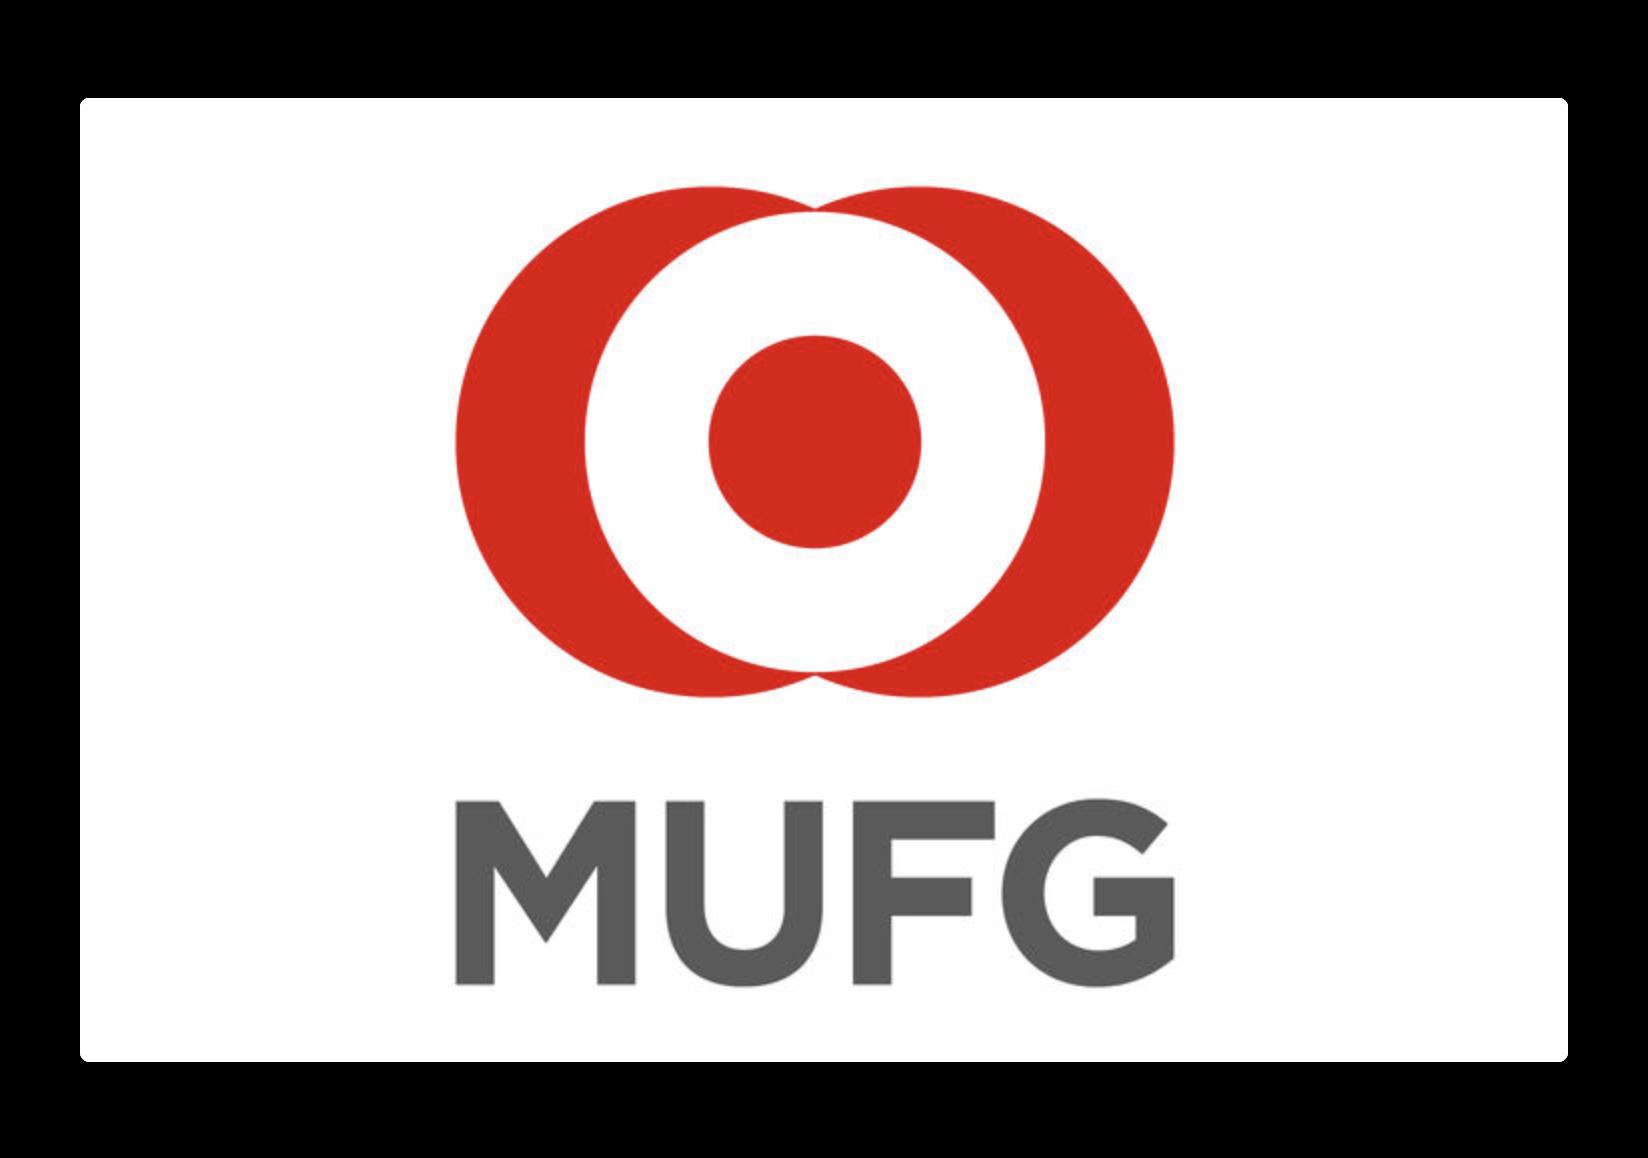 【iOS】「三菱UFJ銀行」行名変更に伴いアプリ名変更、注意する点は・・・